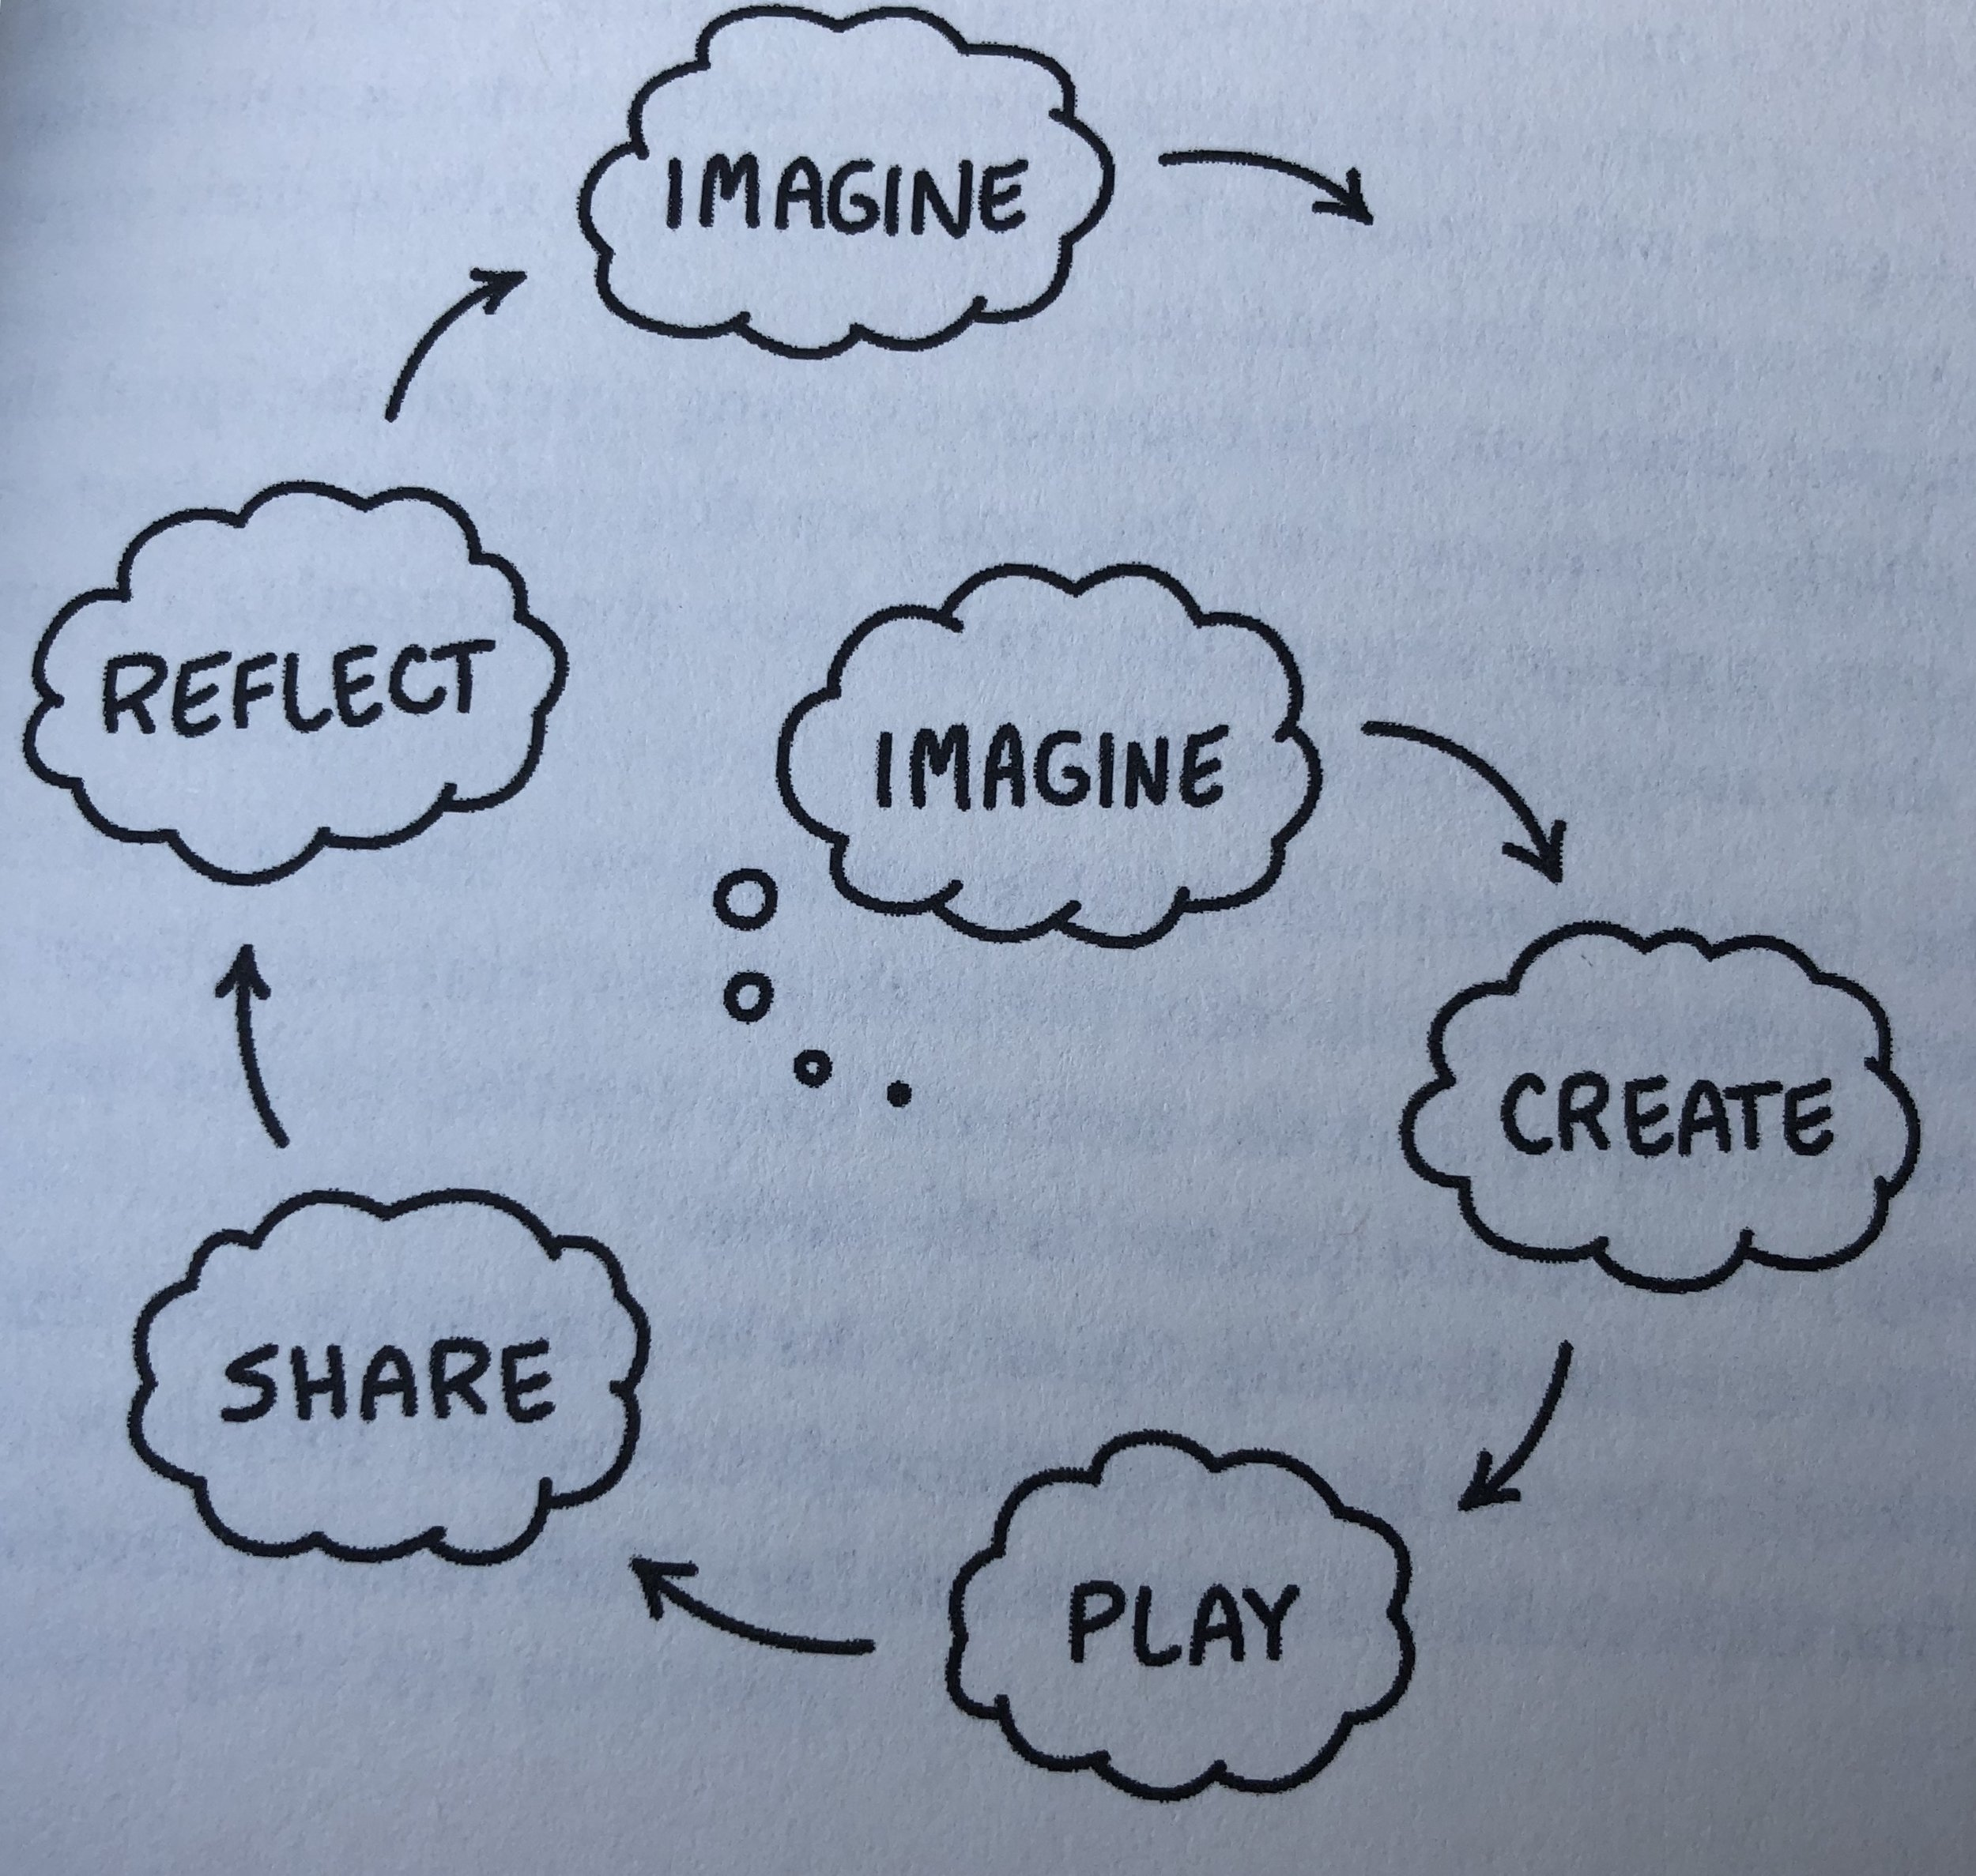 Creative Learning Spiral - Lifelong Kindergarten p11 より抜粋